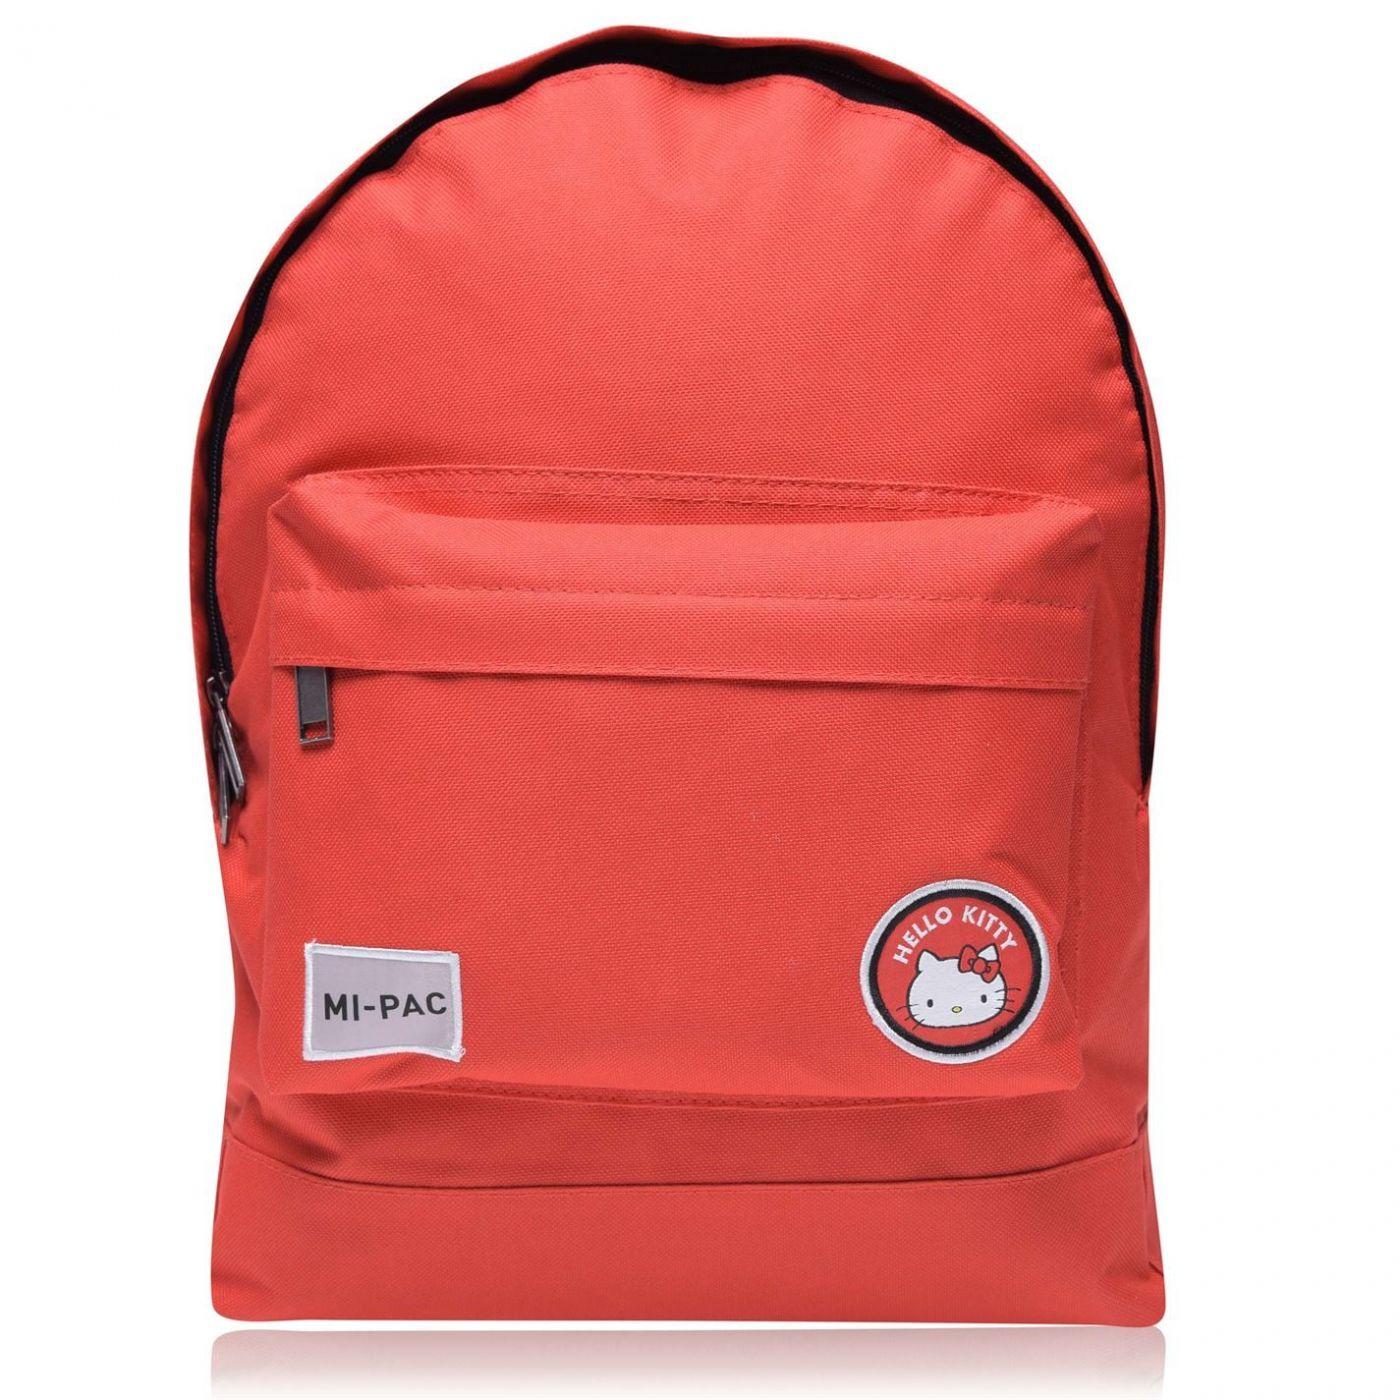 Mi Pac Hello Kitty Backpack